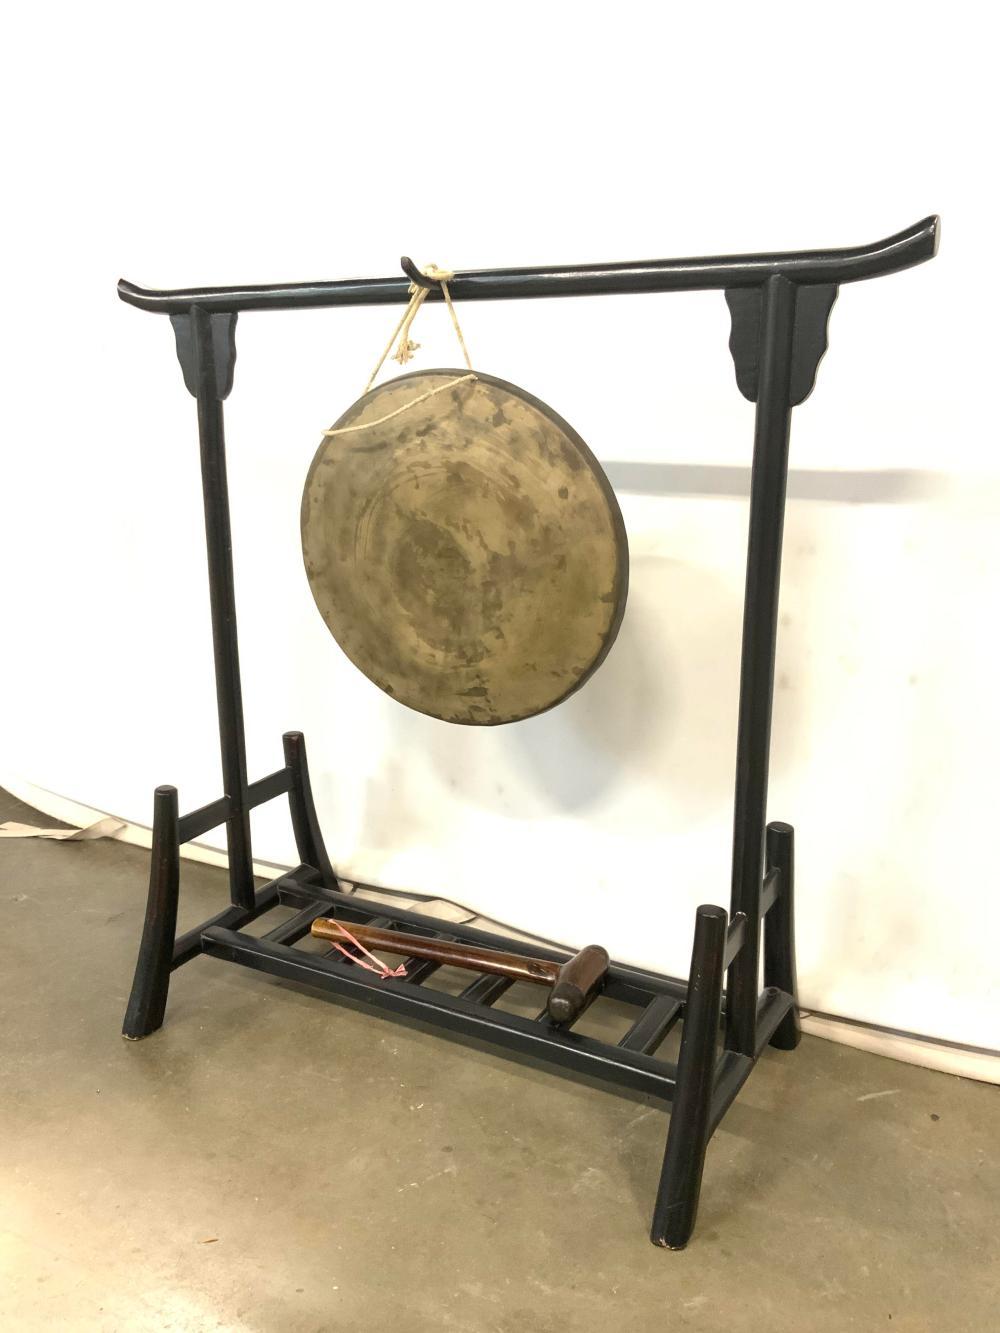 Vintage Gong W Wooden Stand & Striker